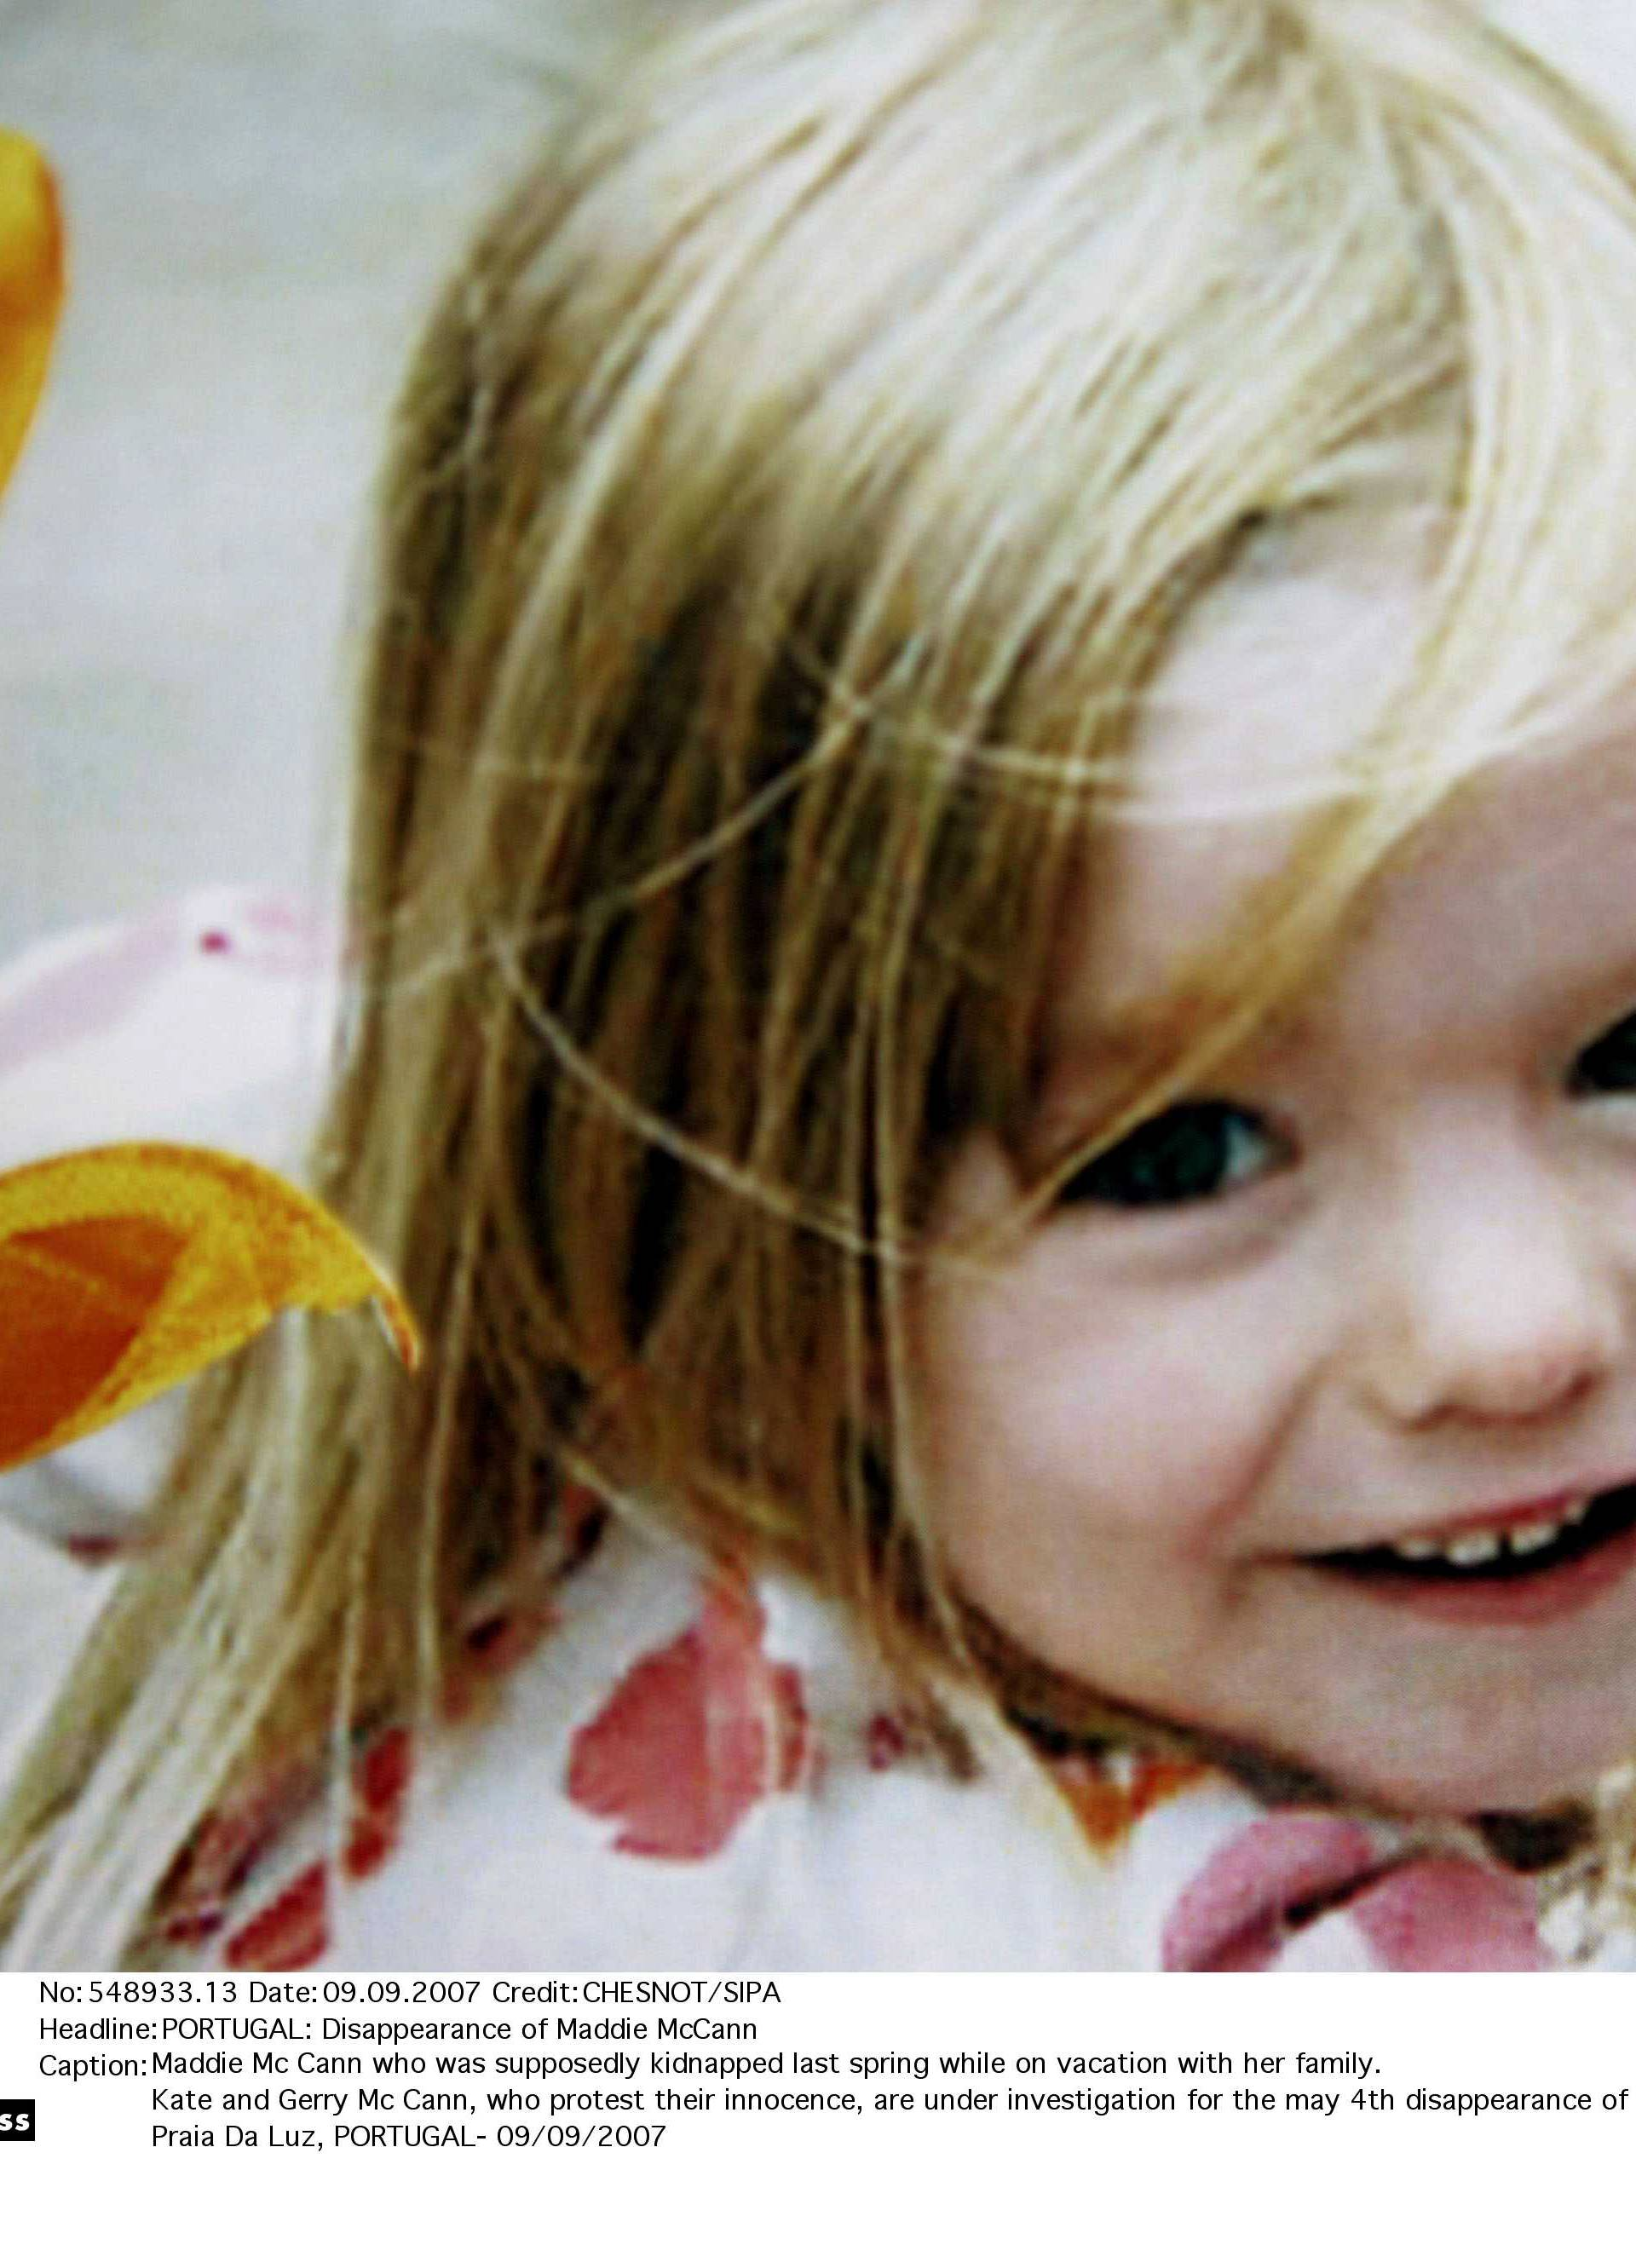 PORTUGAL: Disappearance of Maddie McCann